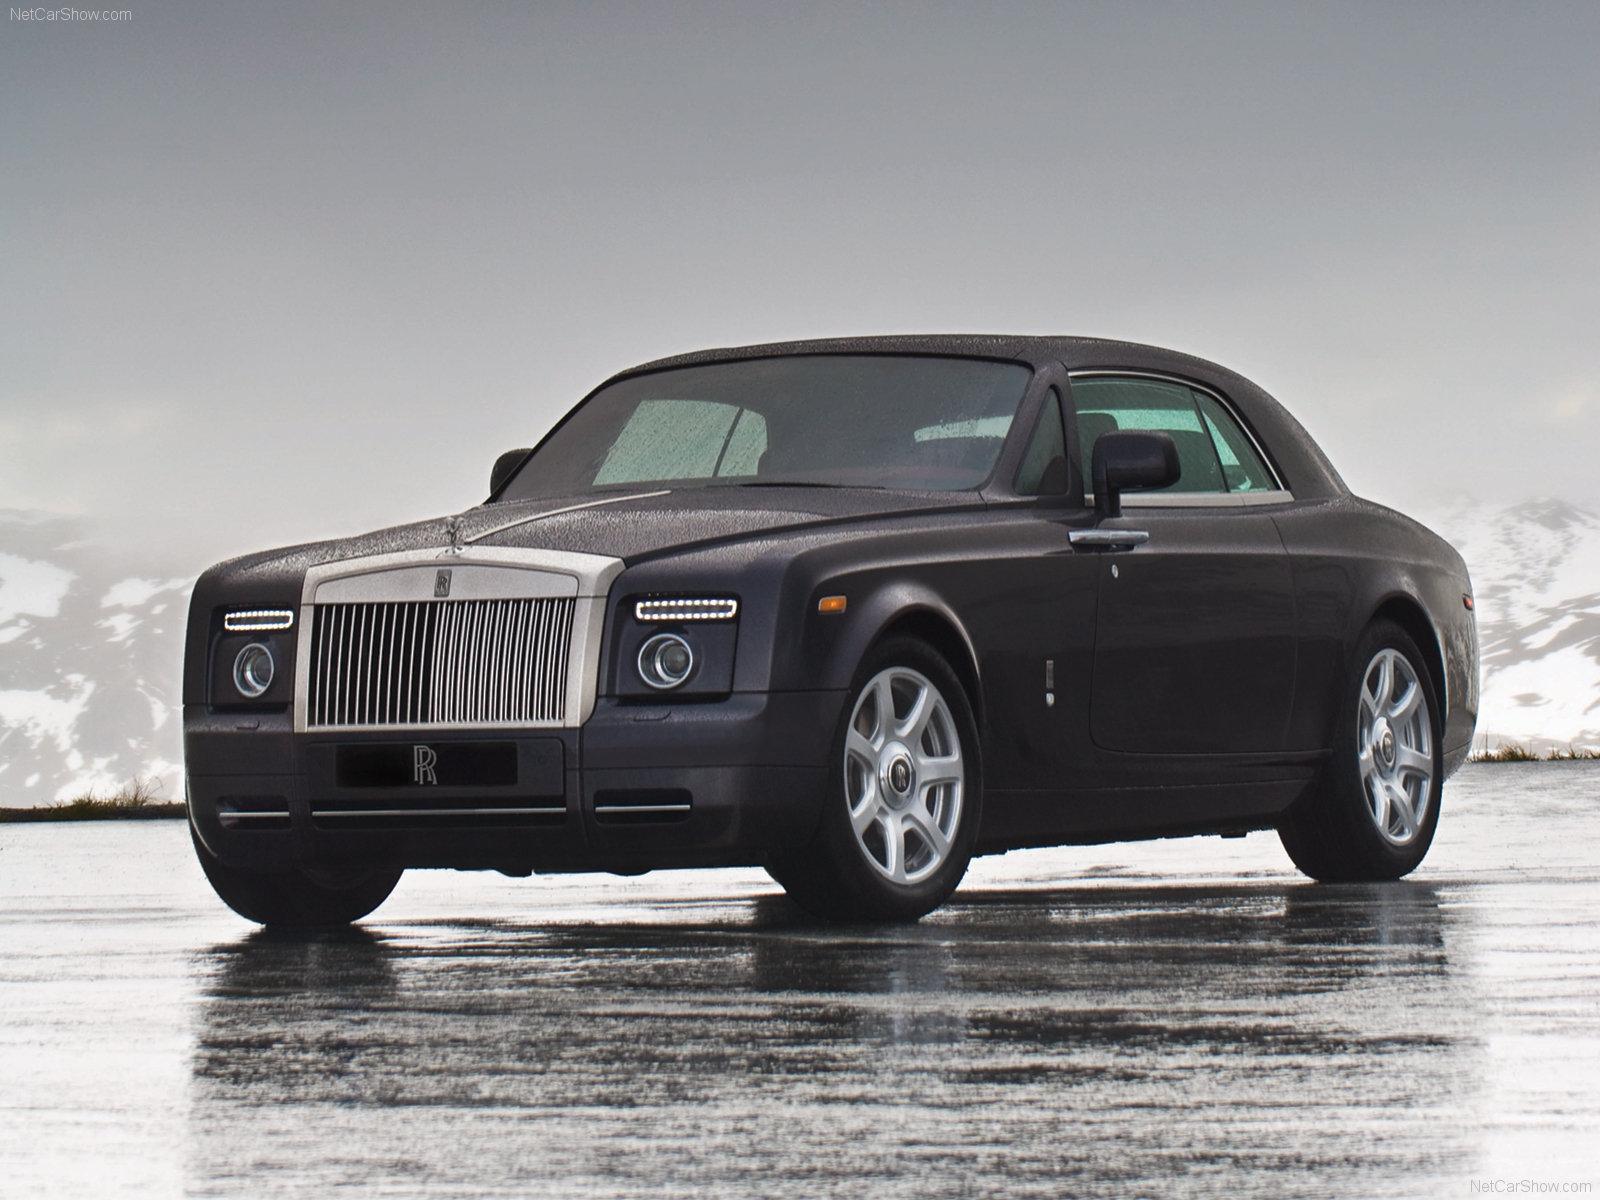 Rolls royce phantom coupe pic